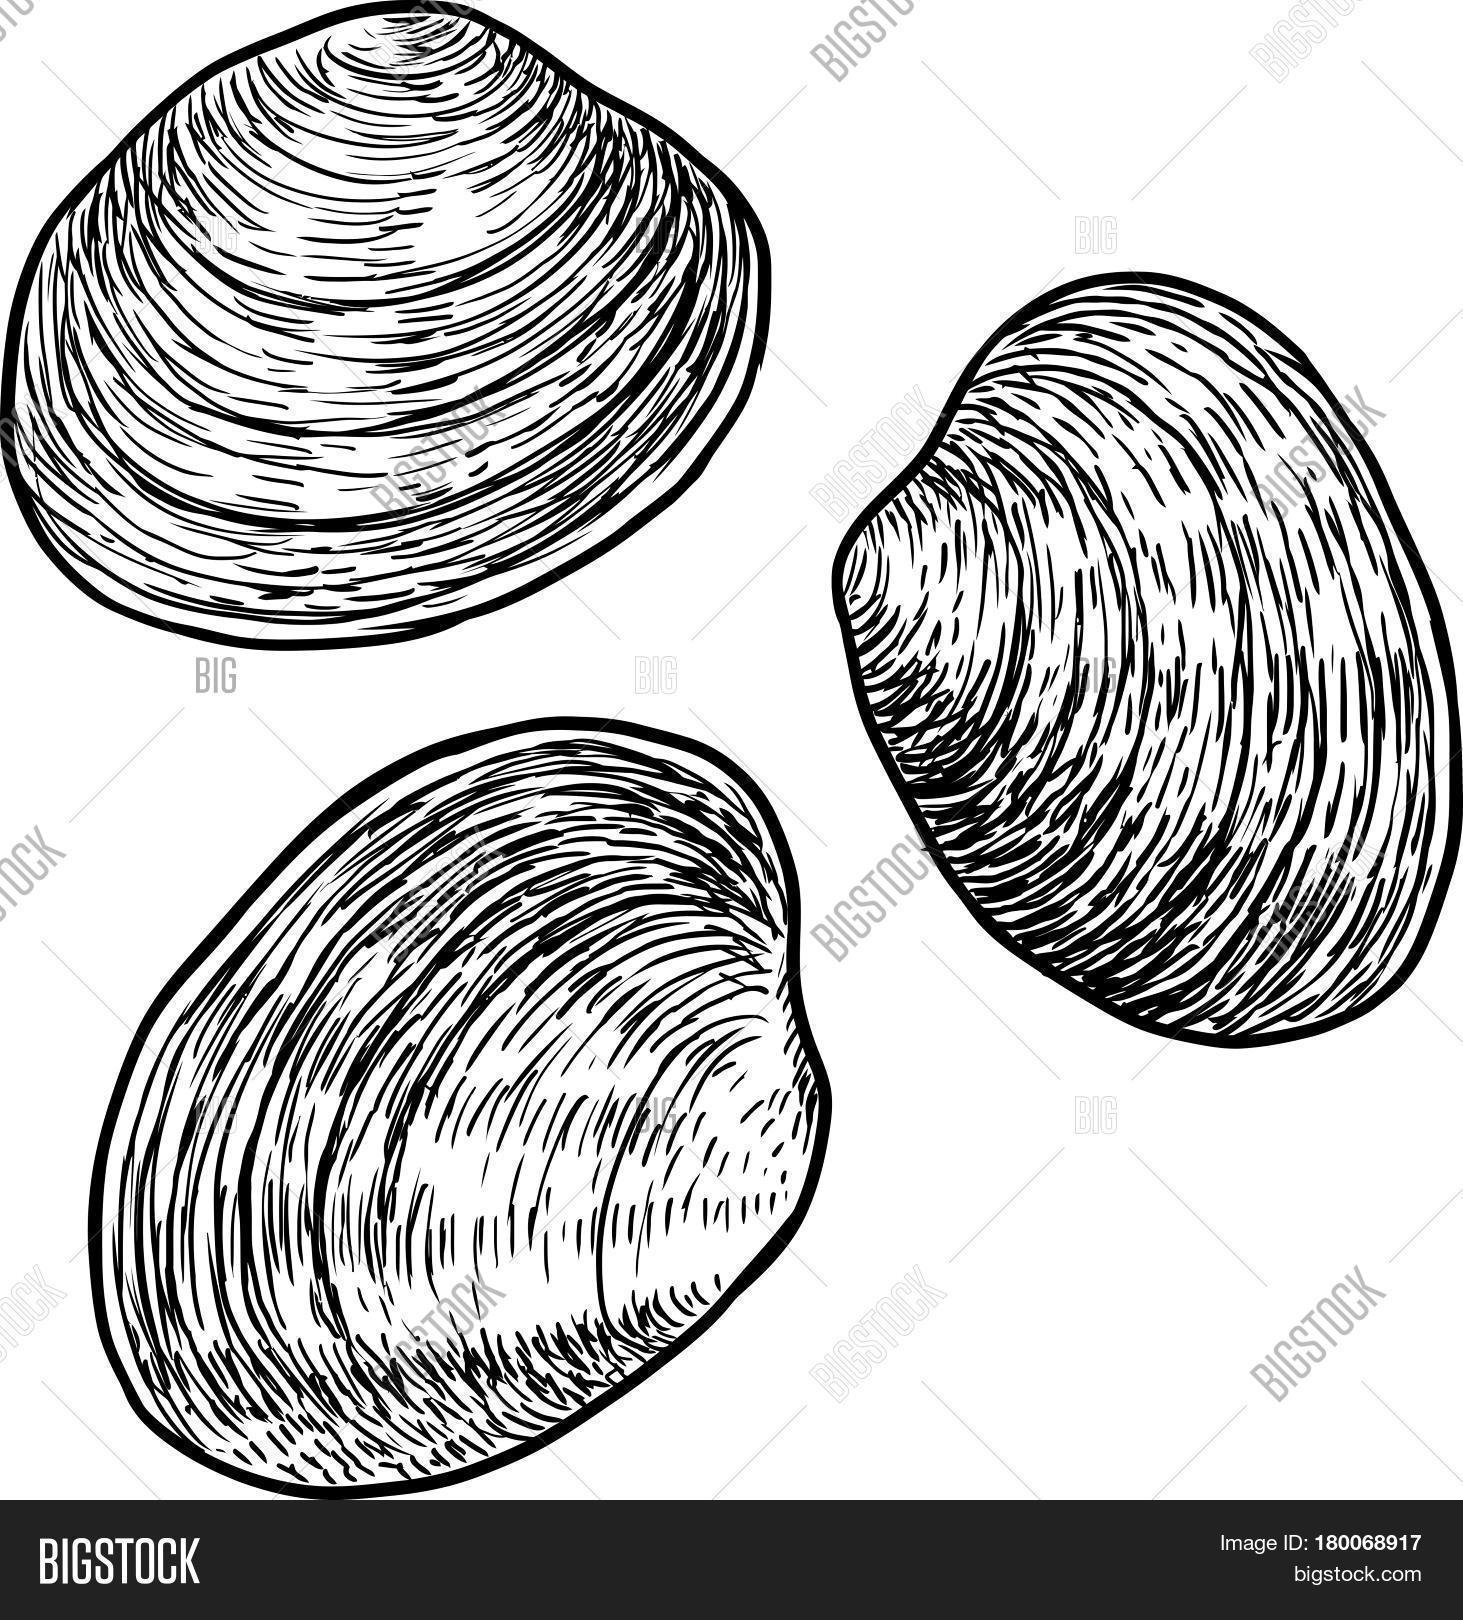 1463x1620 Edible Clam Illustration, Drawing Vector Amp Photo Bigstock